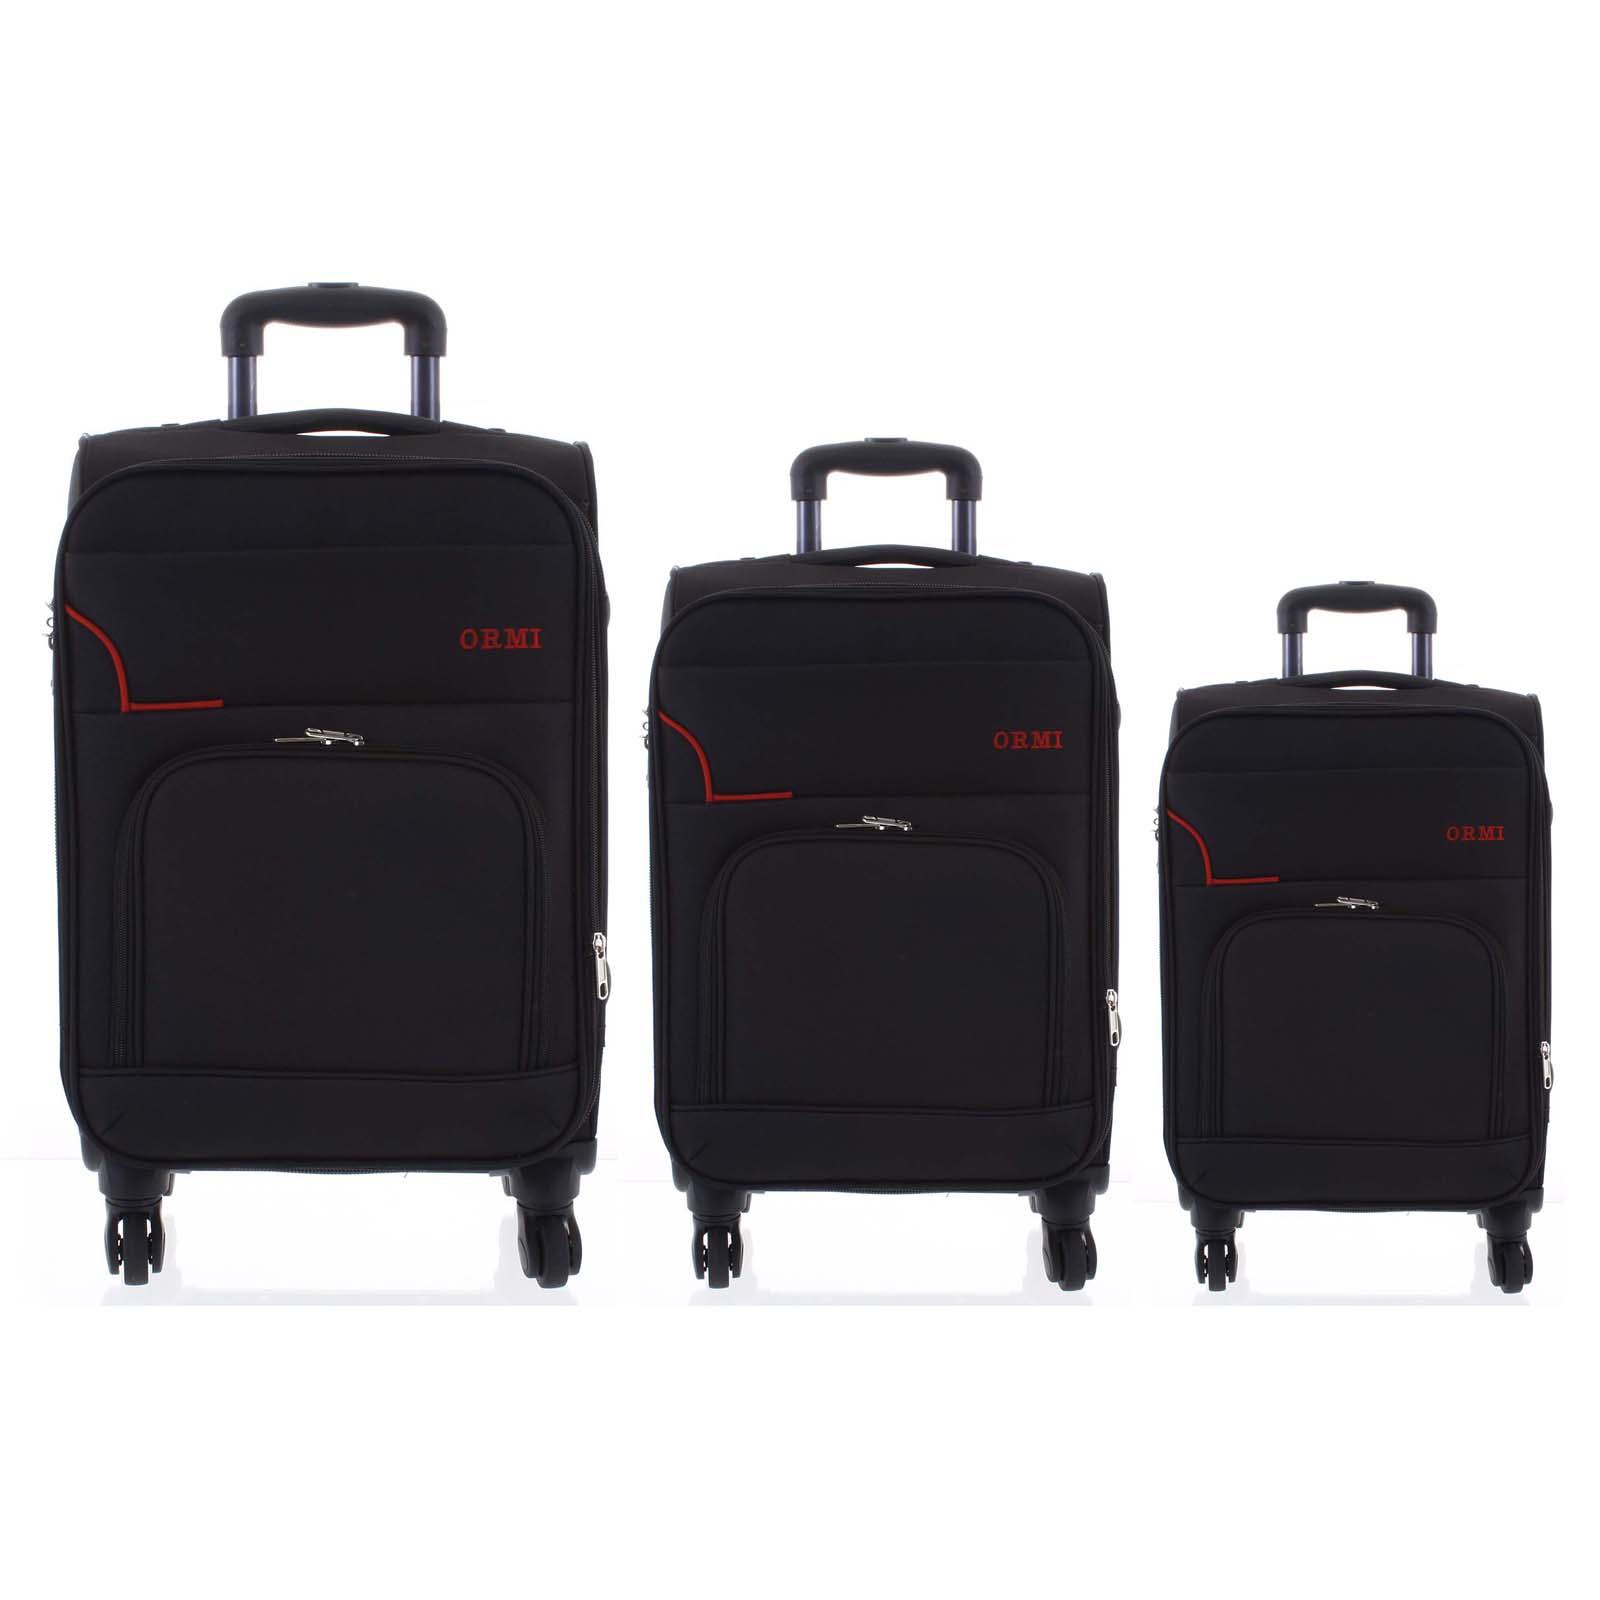 Cestovní látkový černý kufr sada - Ormi Nitire S, M, L